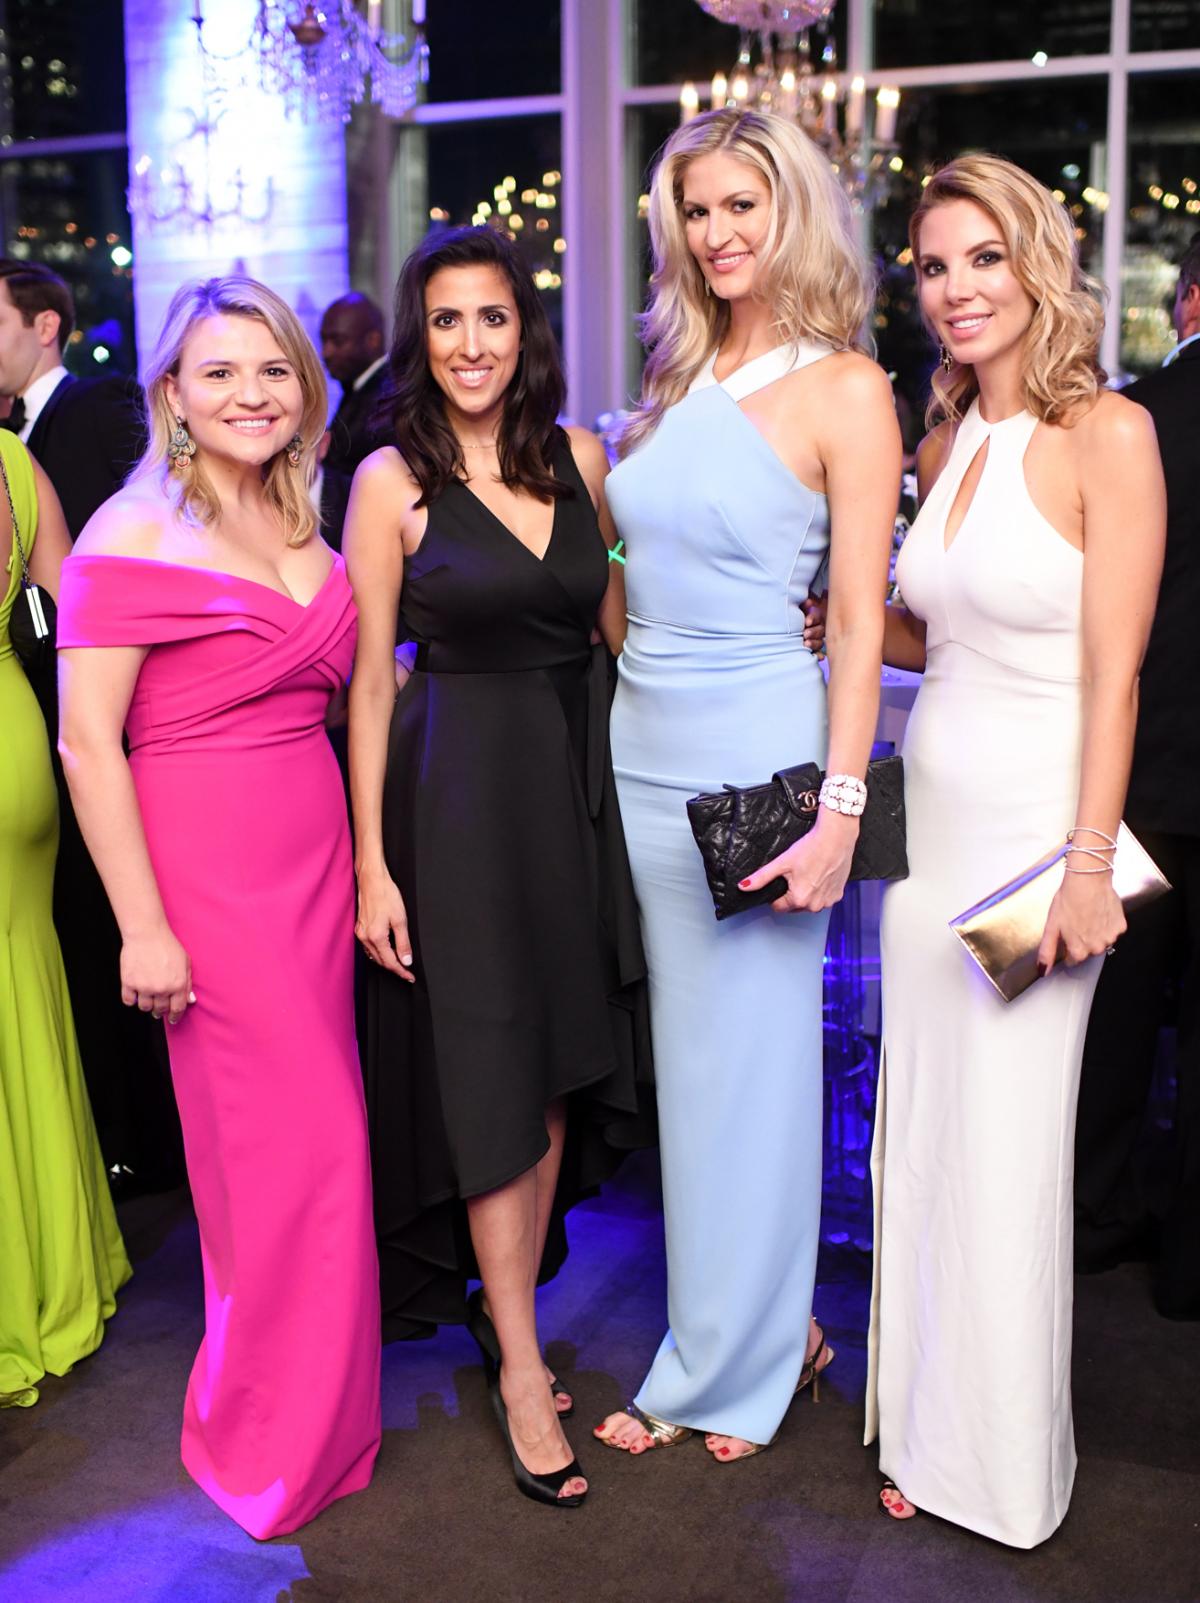 Houston, Jungle Book Gala, Sept. 2017, Brittany Guarglia, Nillie Dj, Shannon Smith, Ashley Metcalf